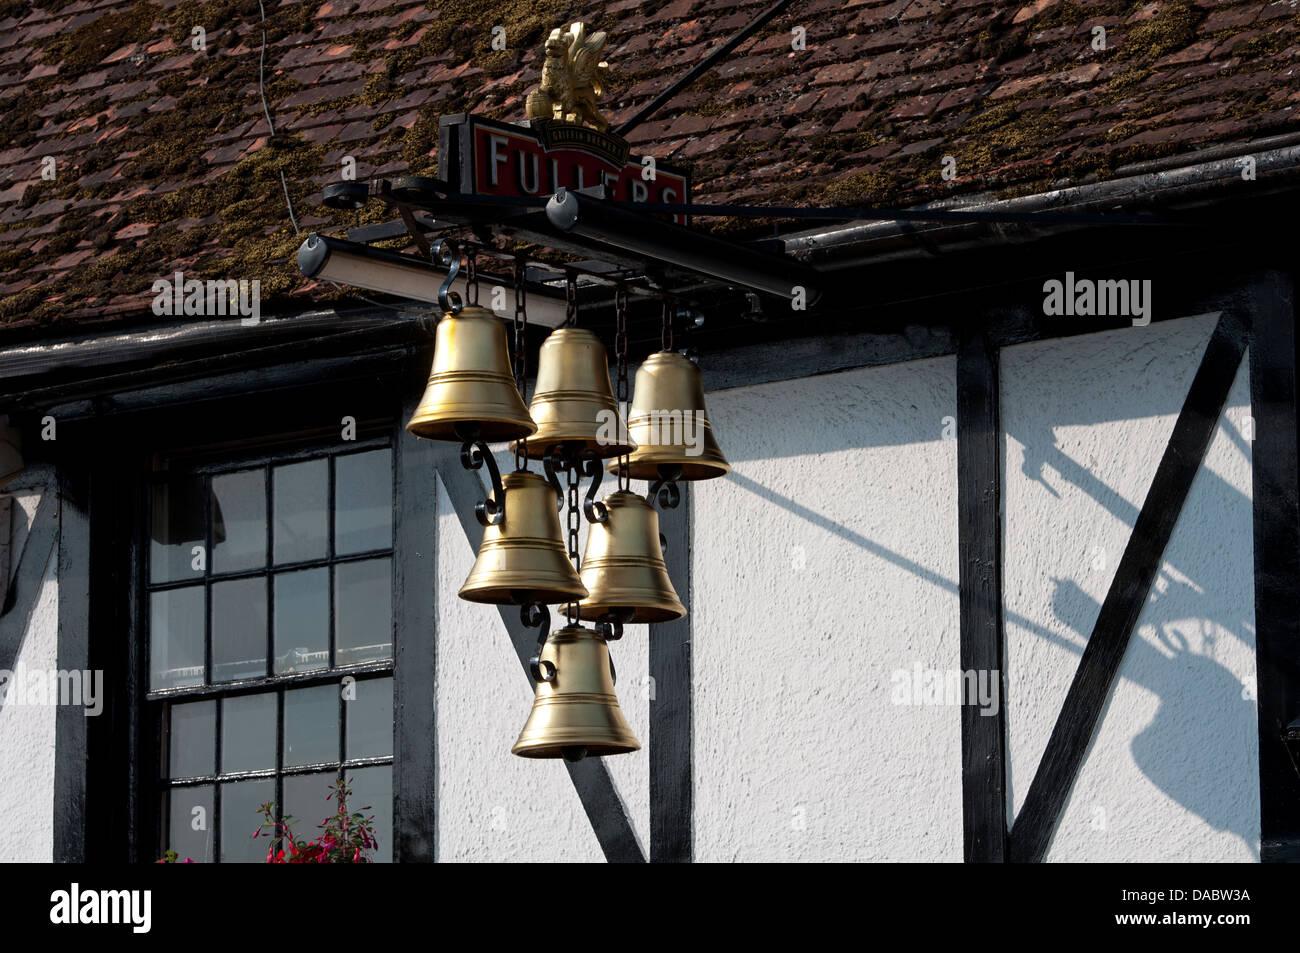 The Six Bells pub sign, Thame, Oxfordshire, UK - Stock Image